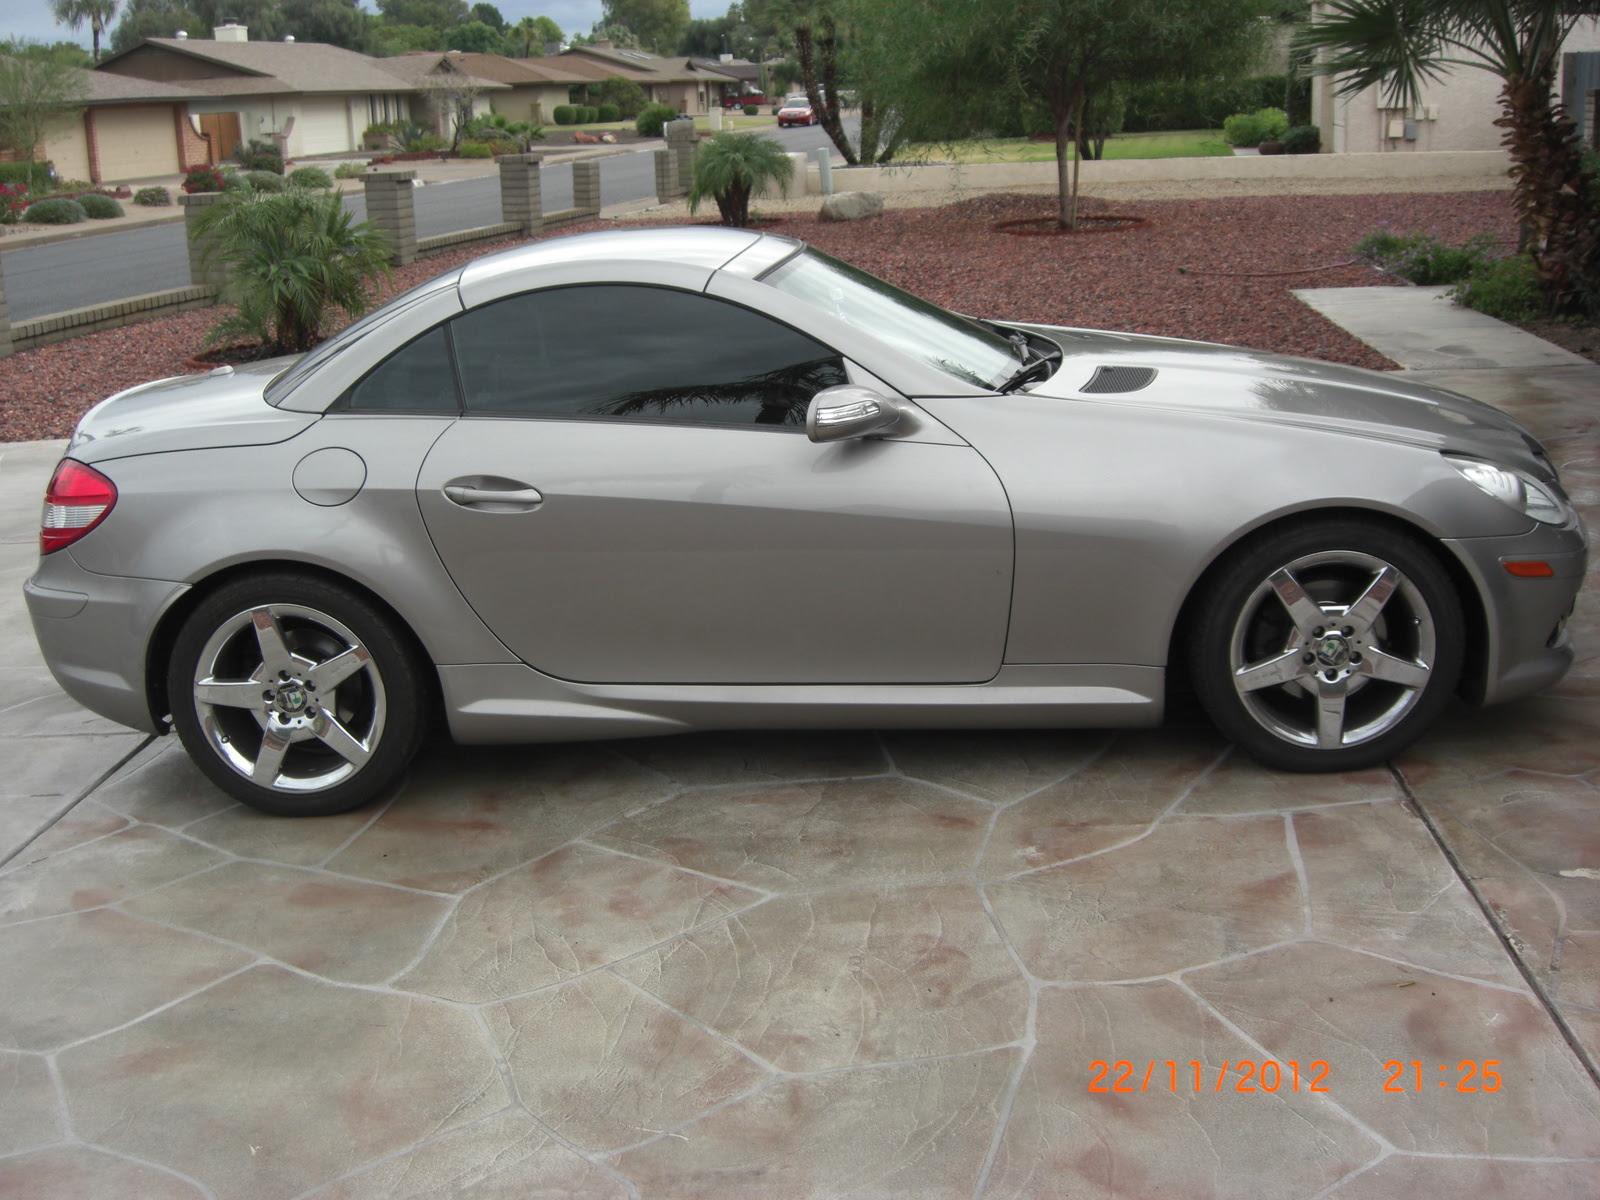 2005 Mercedes-Benz SLK-Class - Pictures - CarGurus